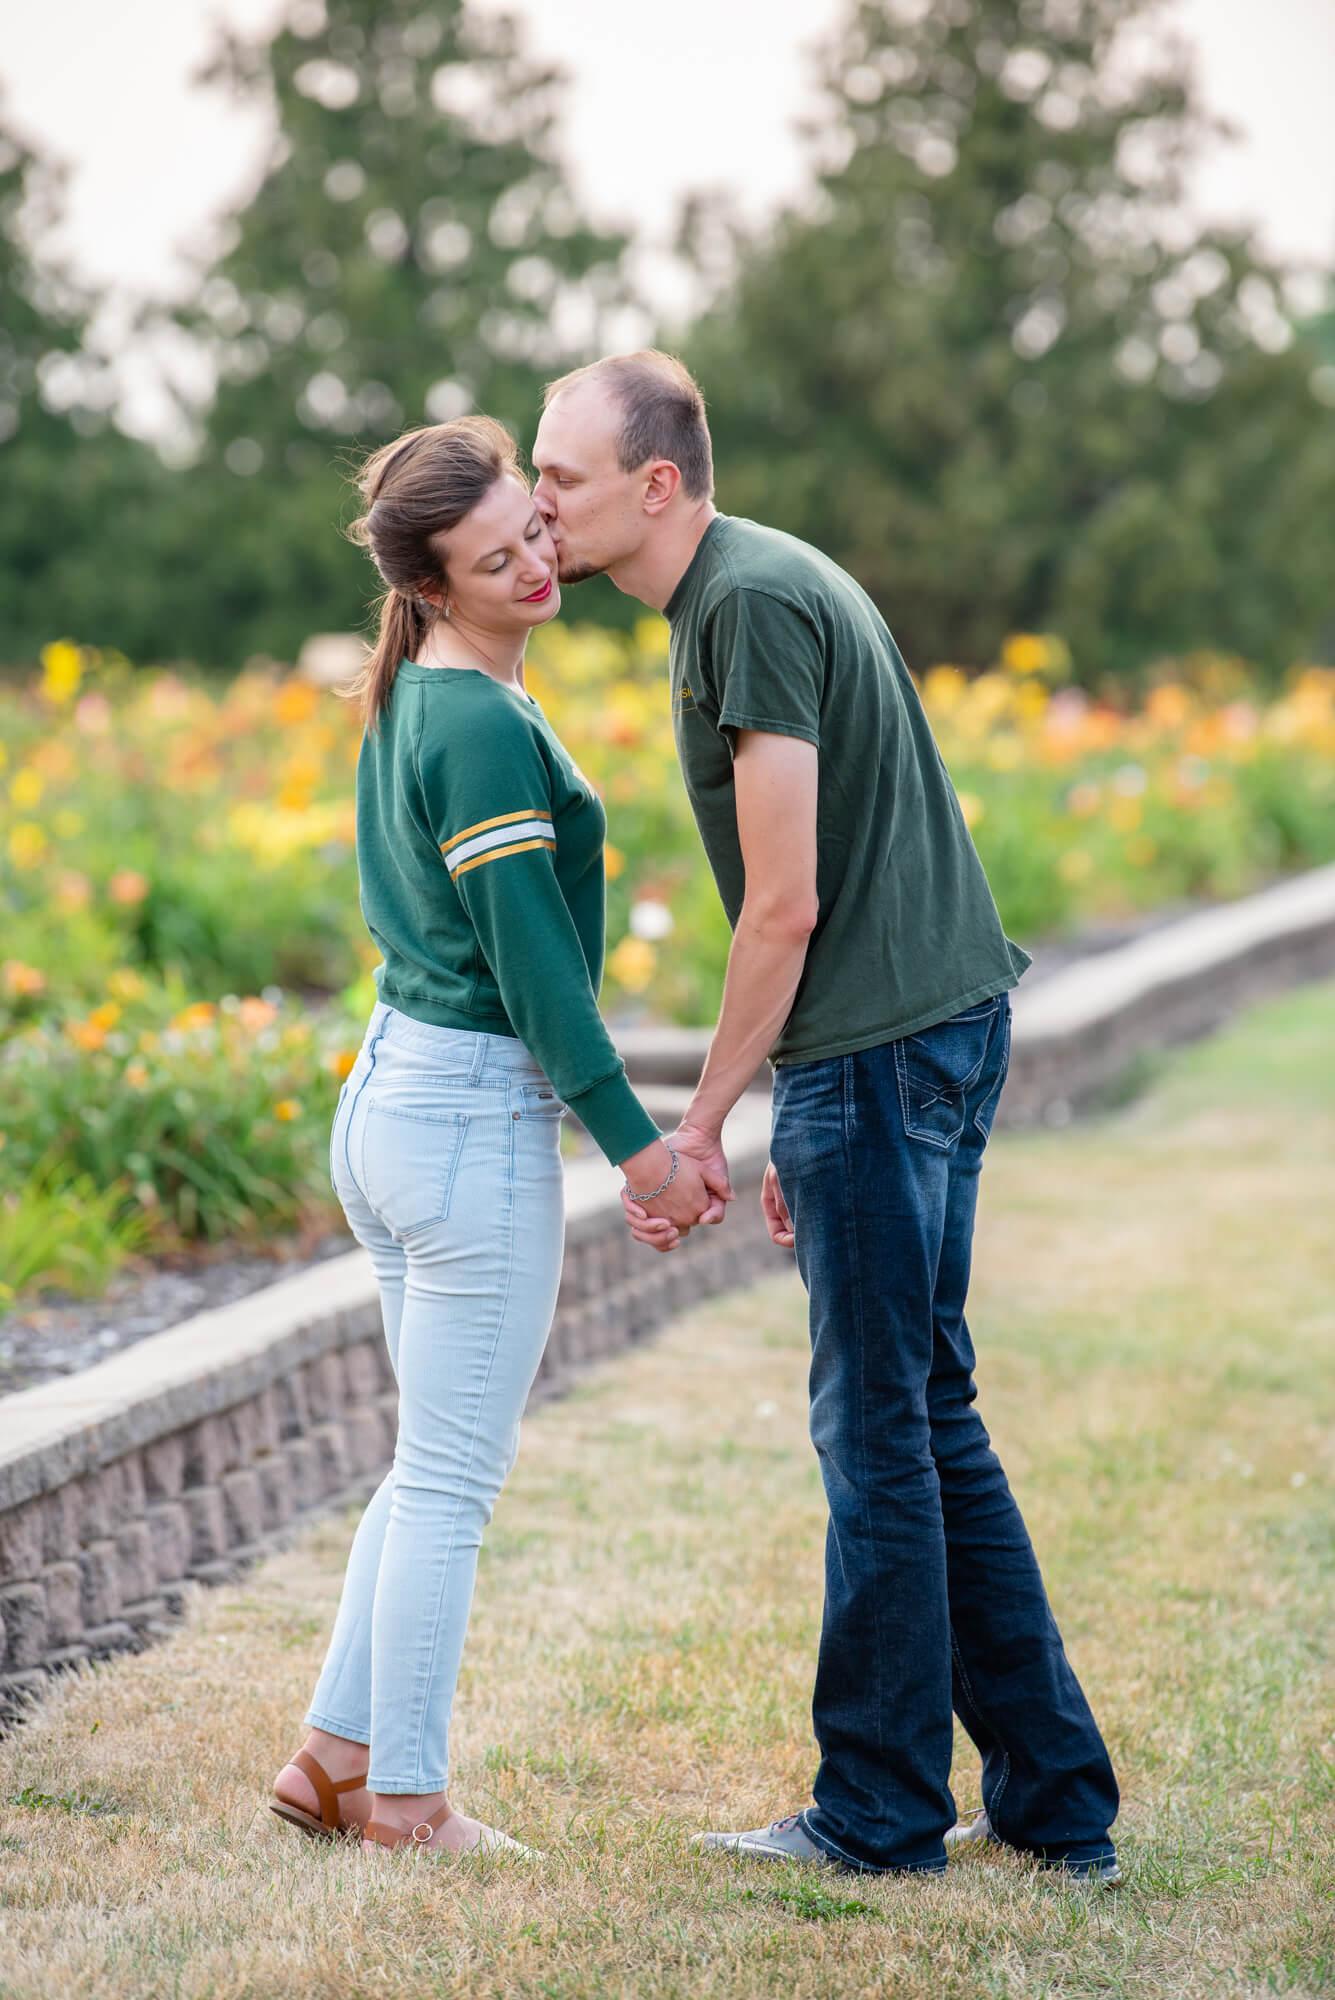 DSC 5155 - John and Faith's Engagement   Fargo, North Dakota